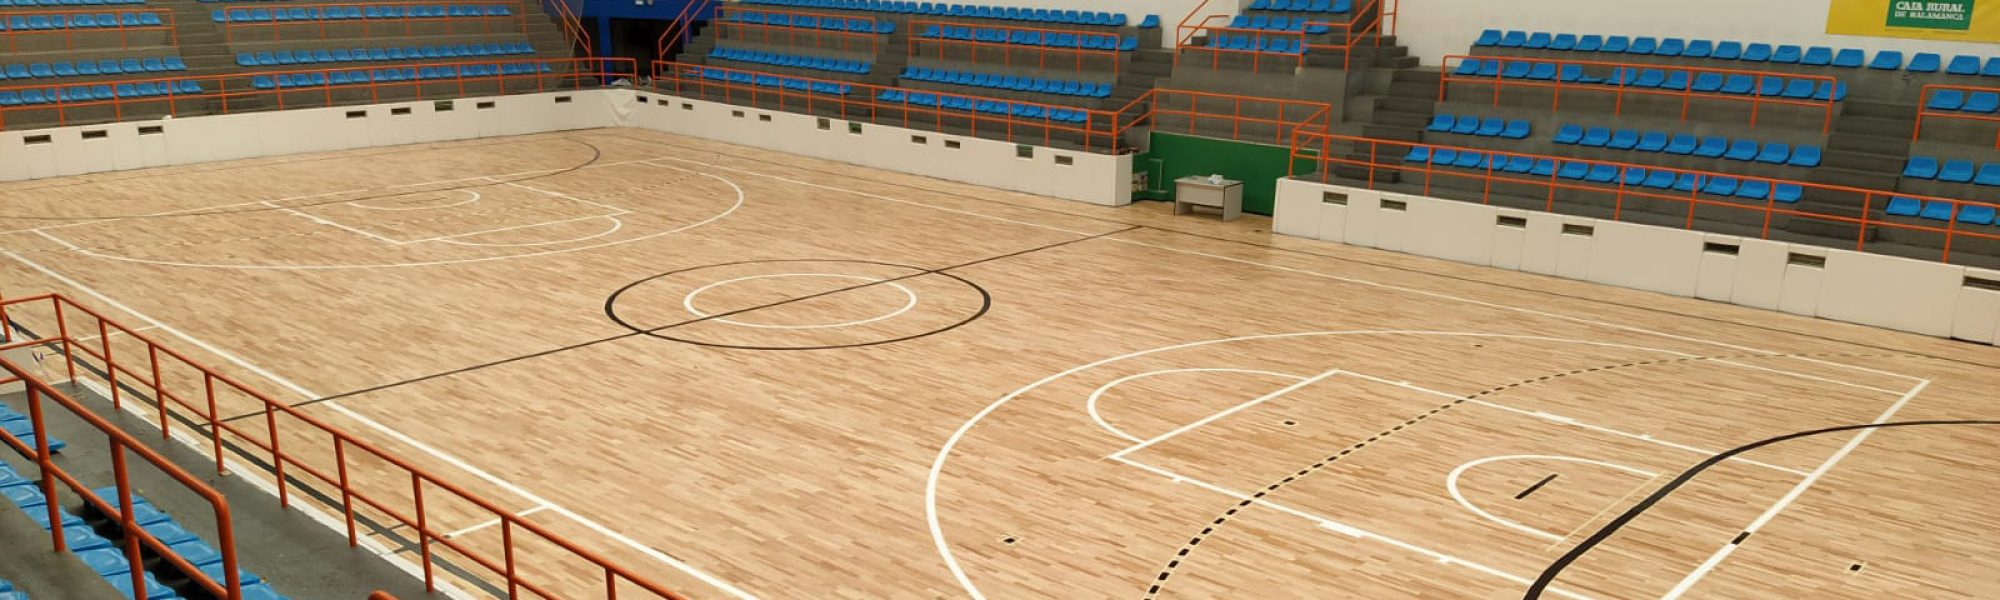 El pabellón salmantino de La Alamedilla estrena pavimento de madera Zeta System FTS de Mondo